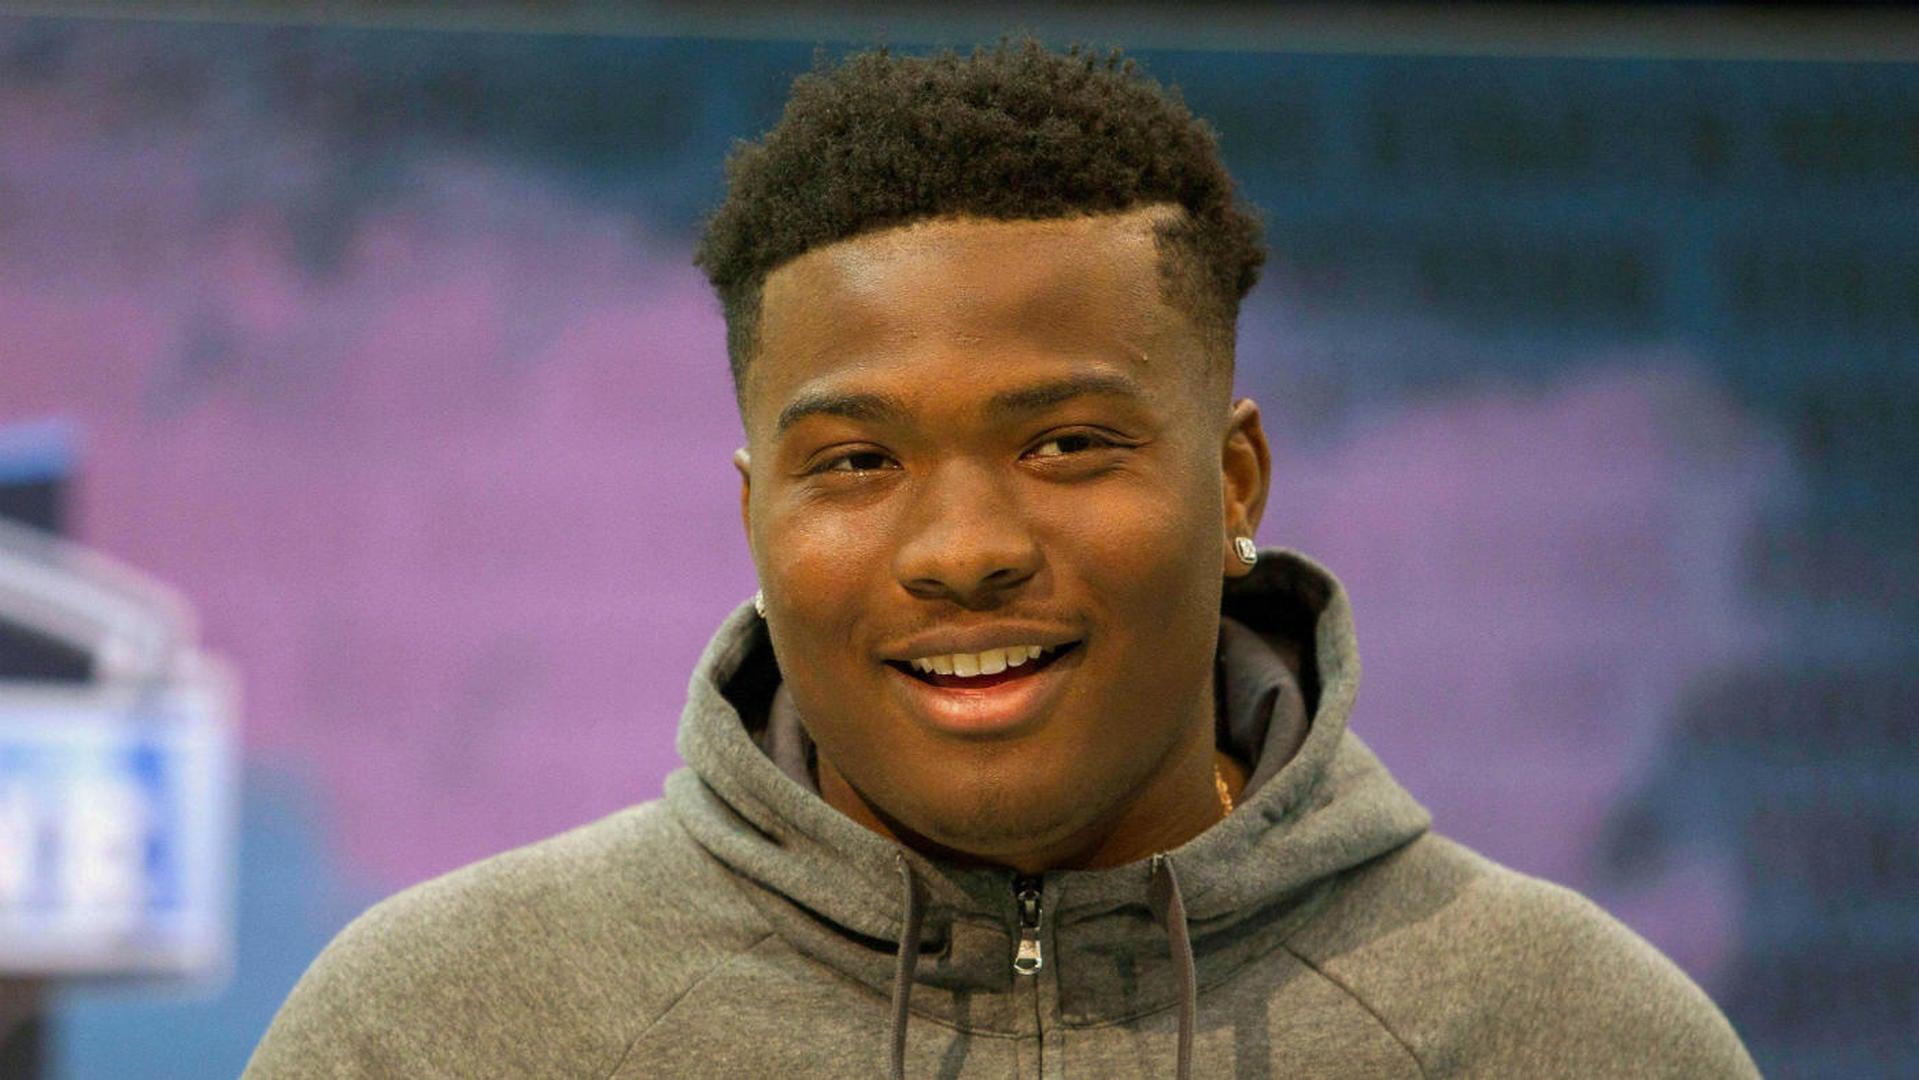 2019 NFL Draft: Could Redskins find trade partner in Jets in an attempt to land Dwayne Haskins?